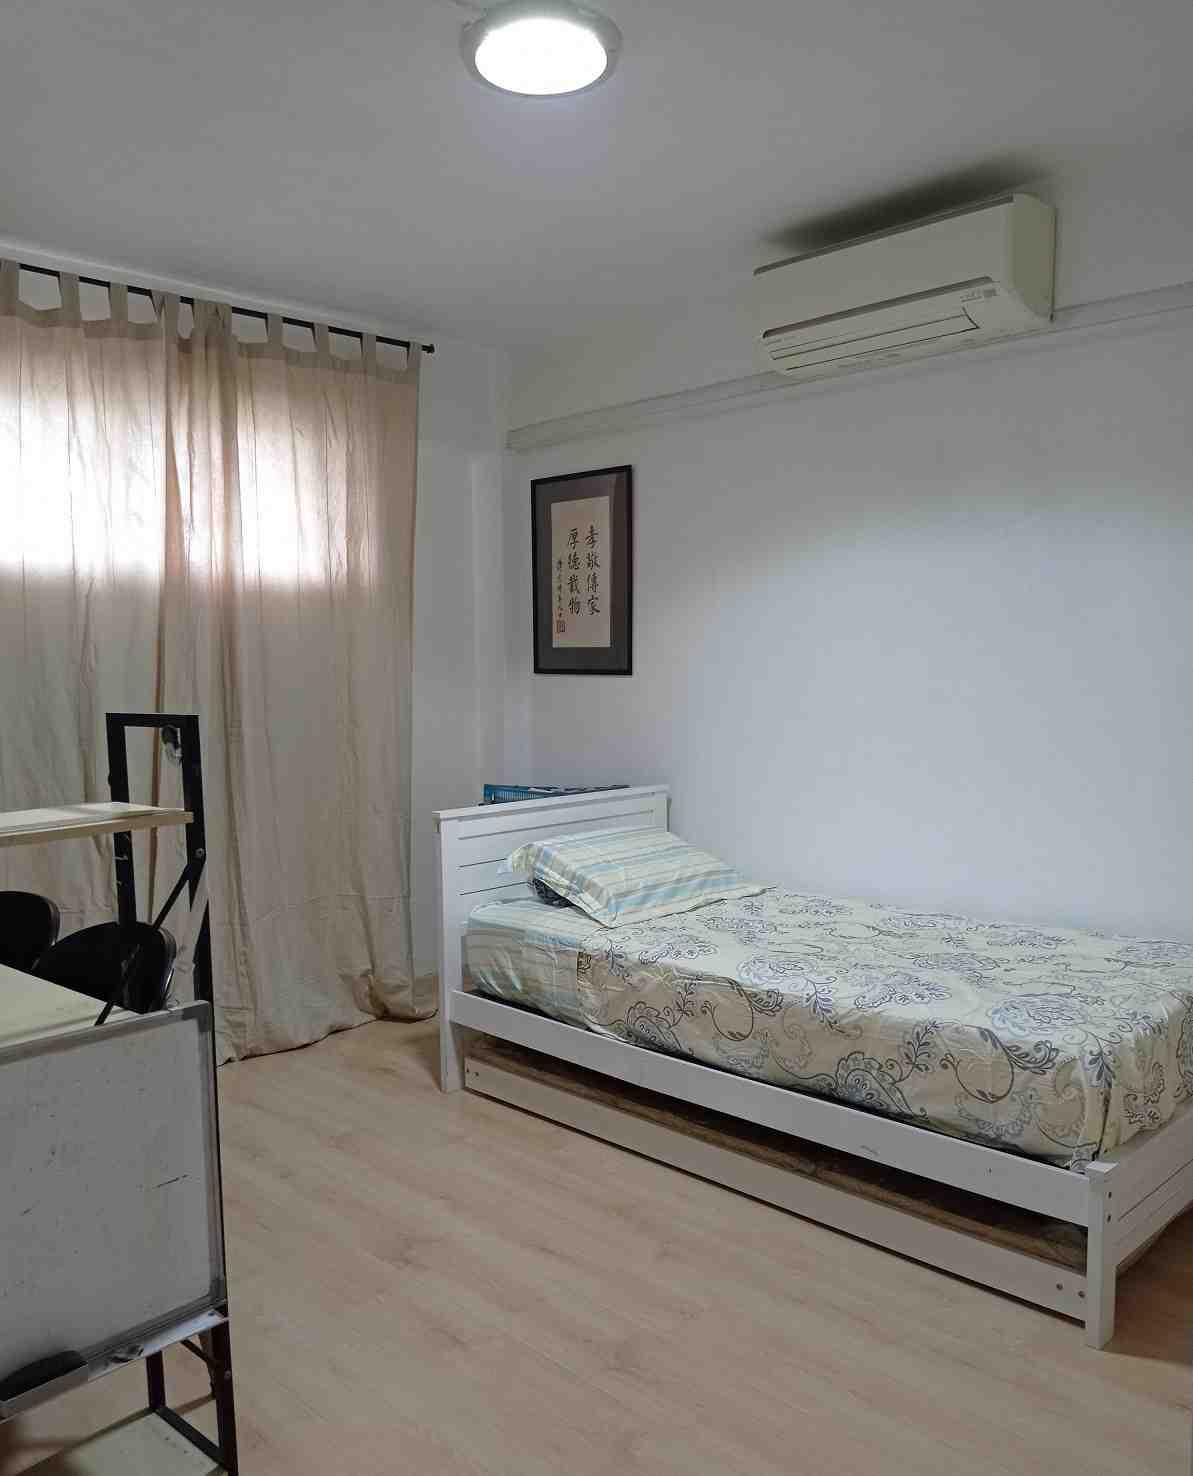 Room 2 overall